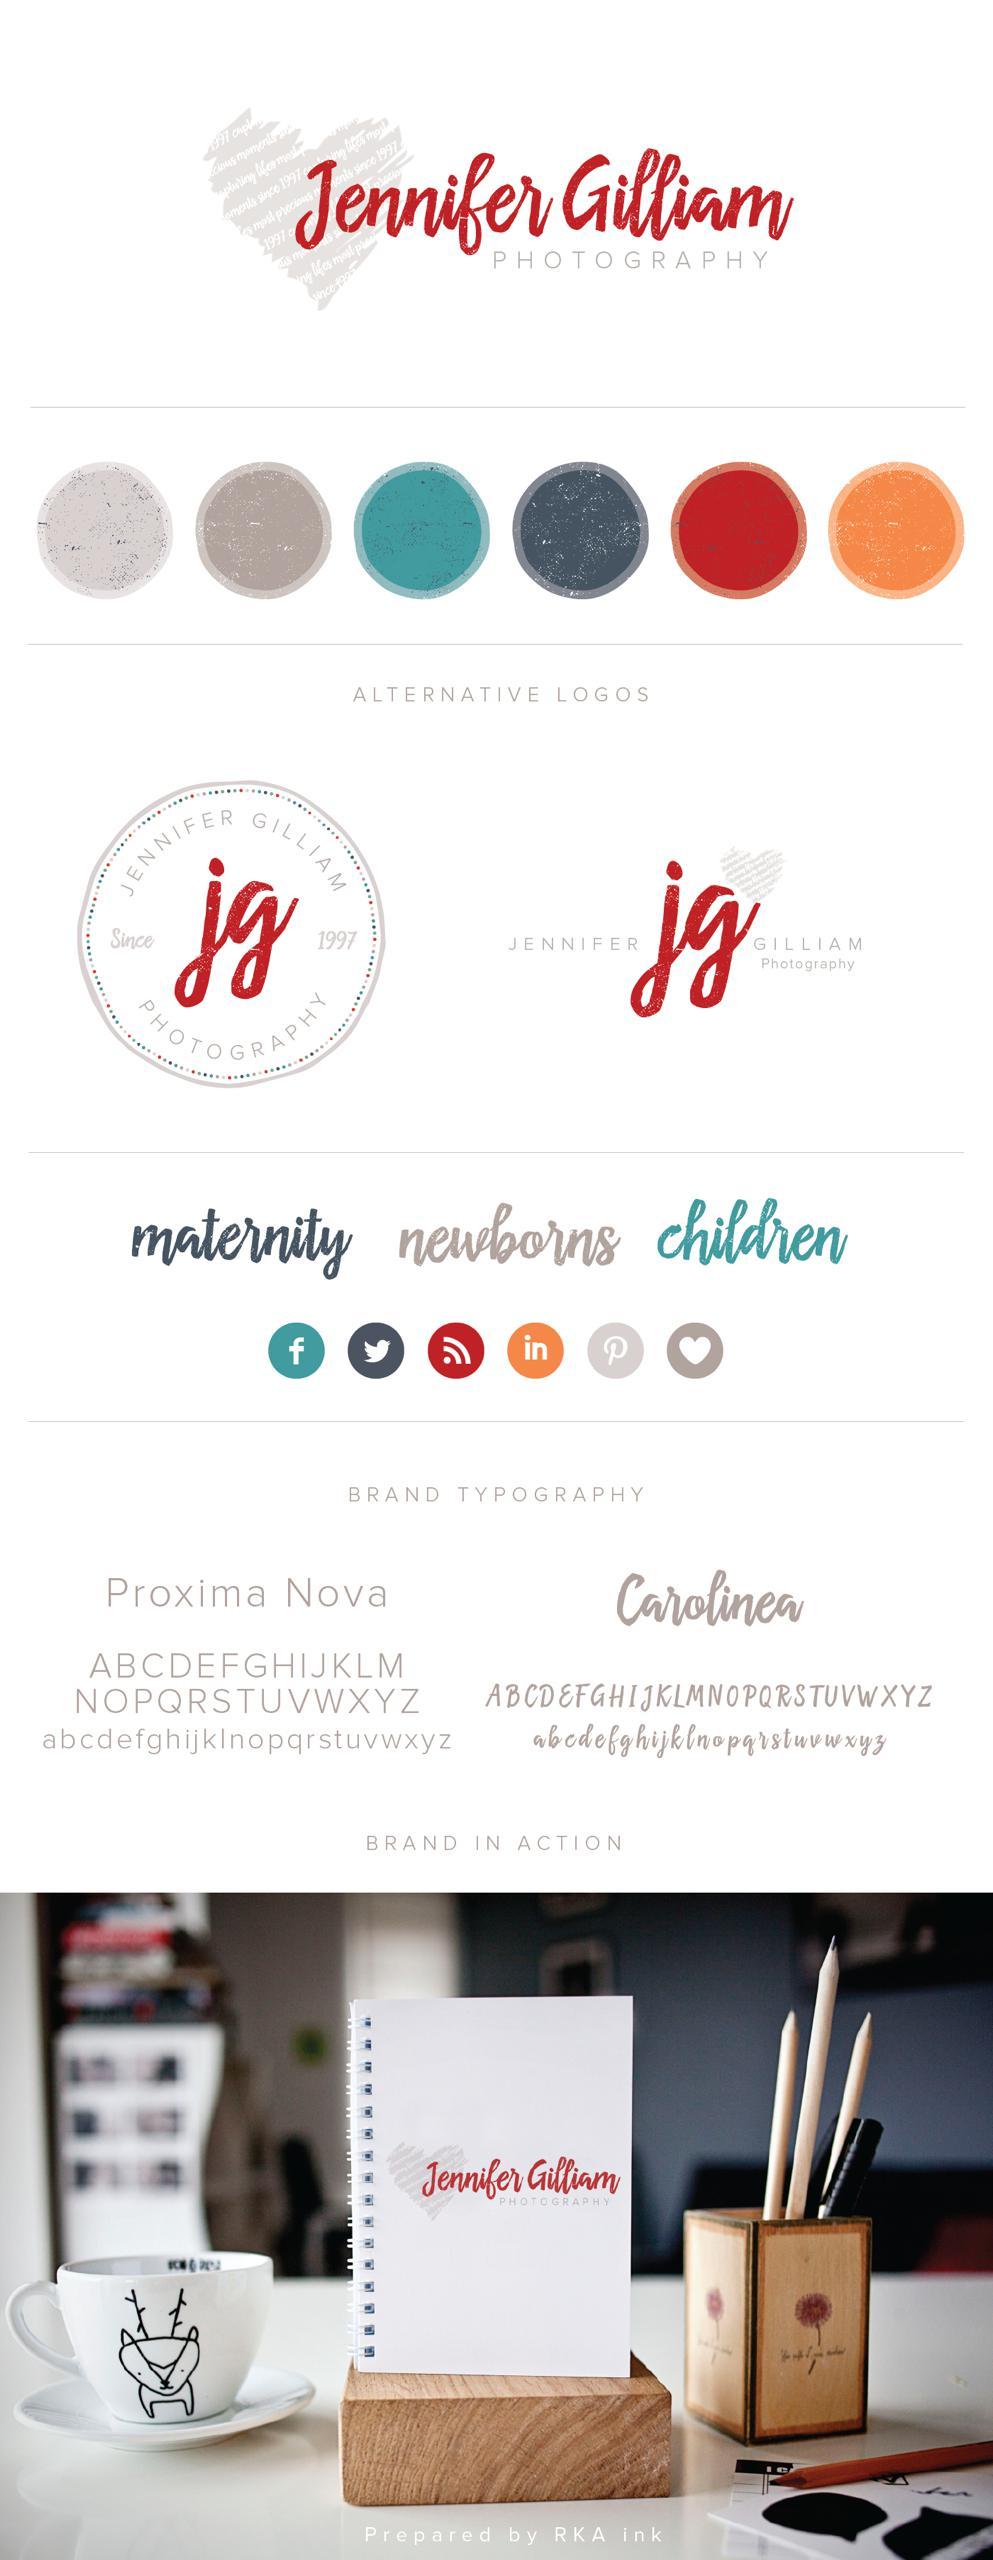 Jennifer Gilliam Identity Design RKA ink